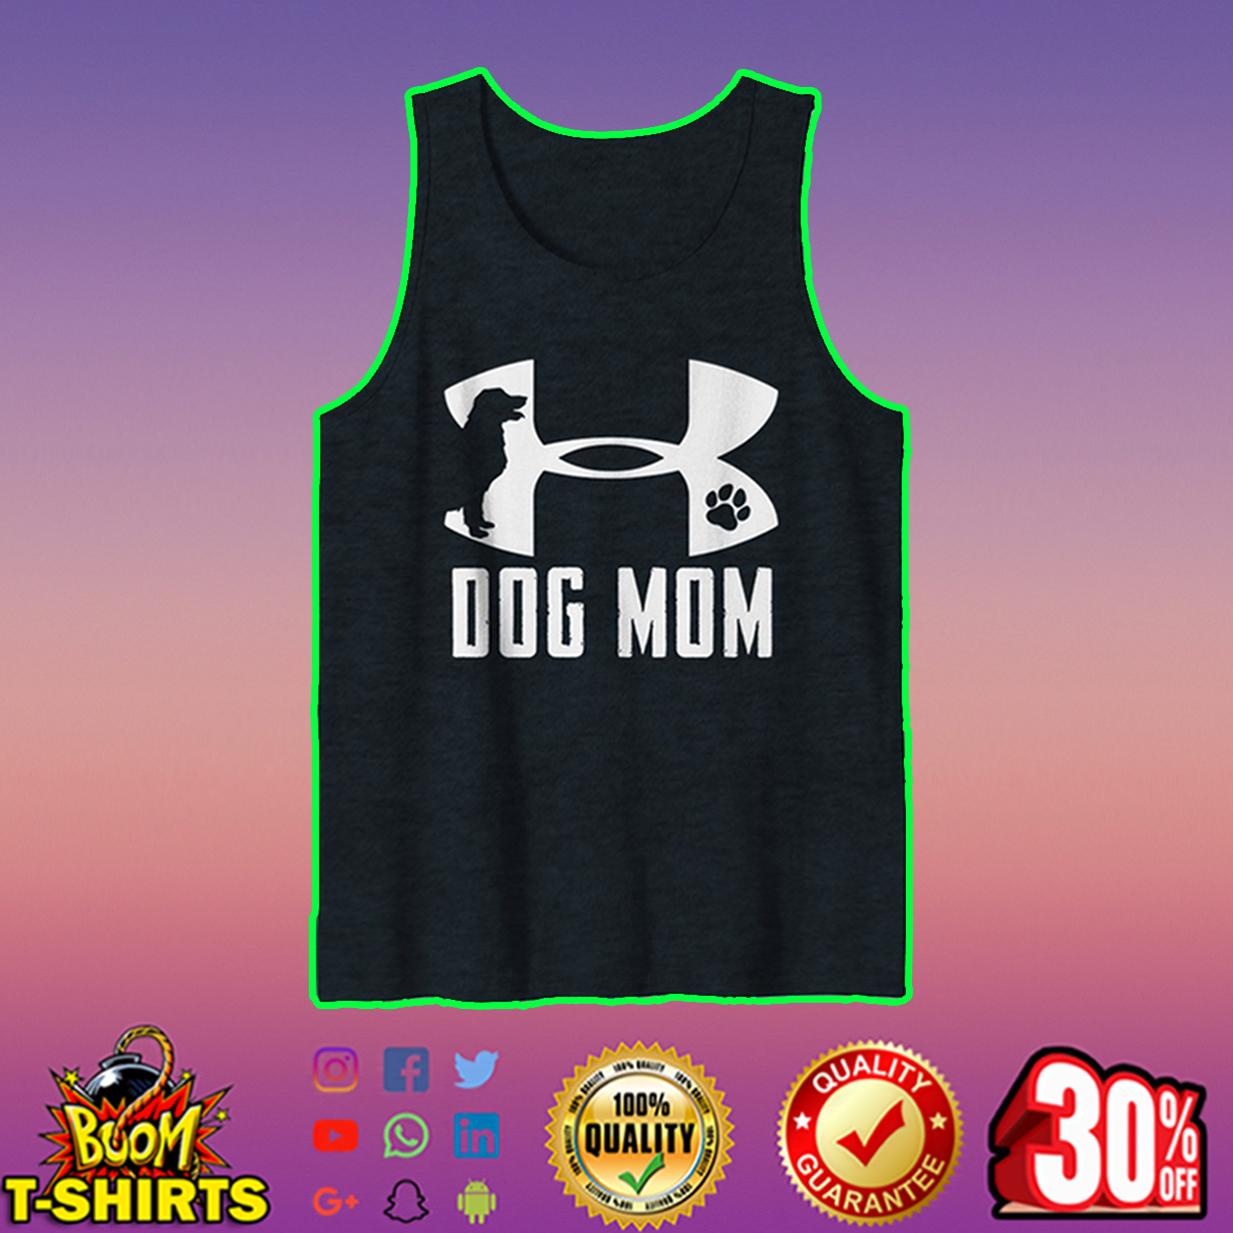 Under Armour Dog Mom tank top